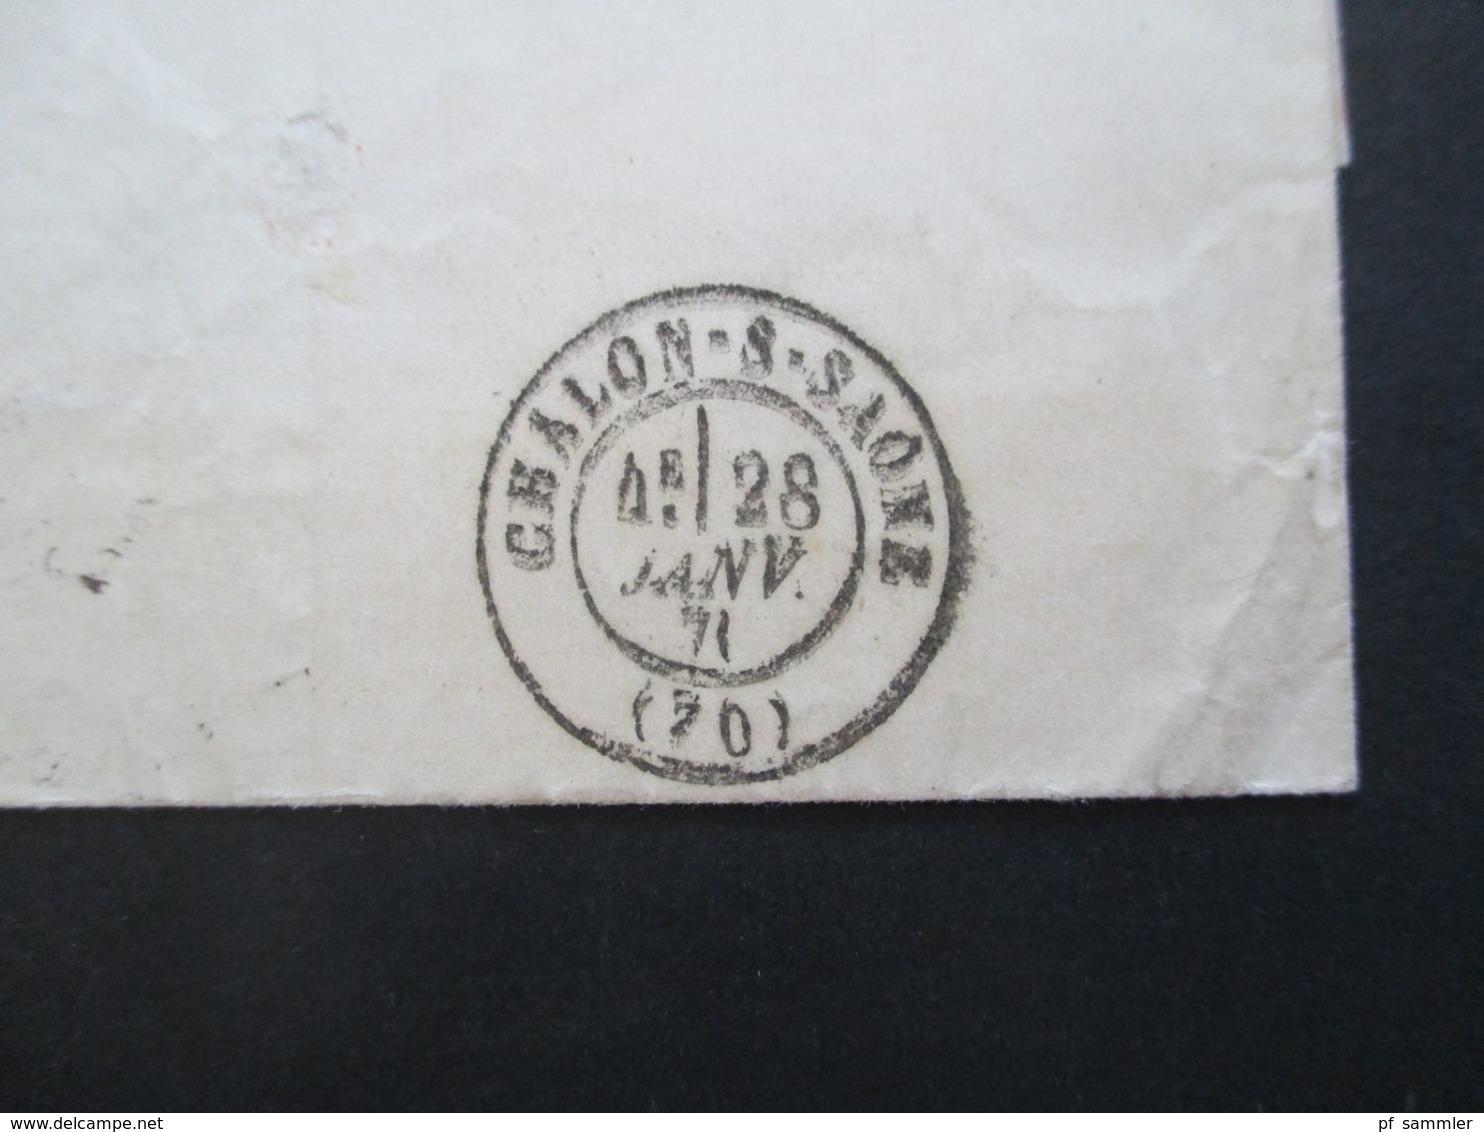 Frankreich Par Ballon Monté 16.1.1871 Brief Mit Inhalt!! Ank. Stempel Chalon - S - Saone Ballonpost Besetztes Paris! - 1870 Siege Of Paris